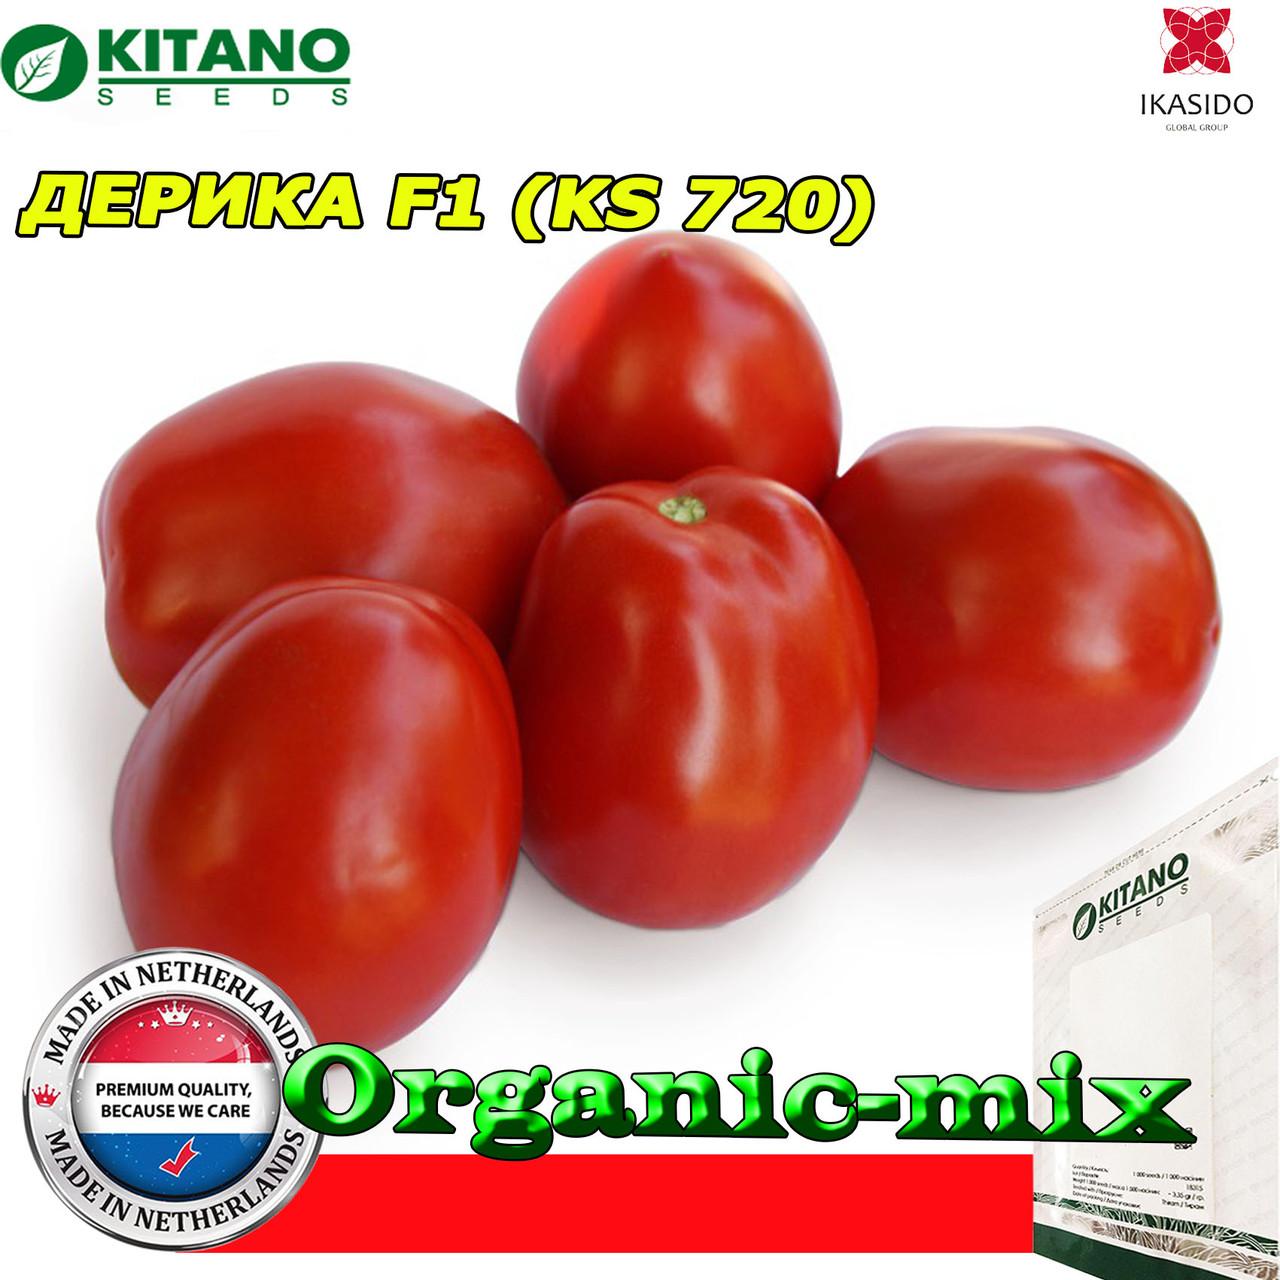 "Семена, томат Дерика F1 ( KS 720), 1000 семян ТМ ""Kitano Seeds"""